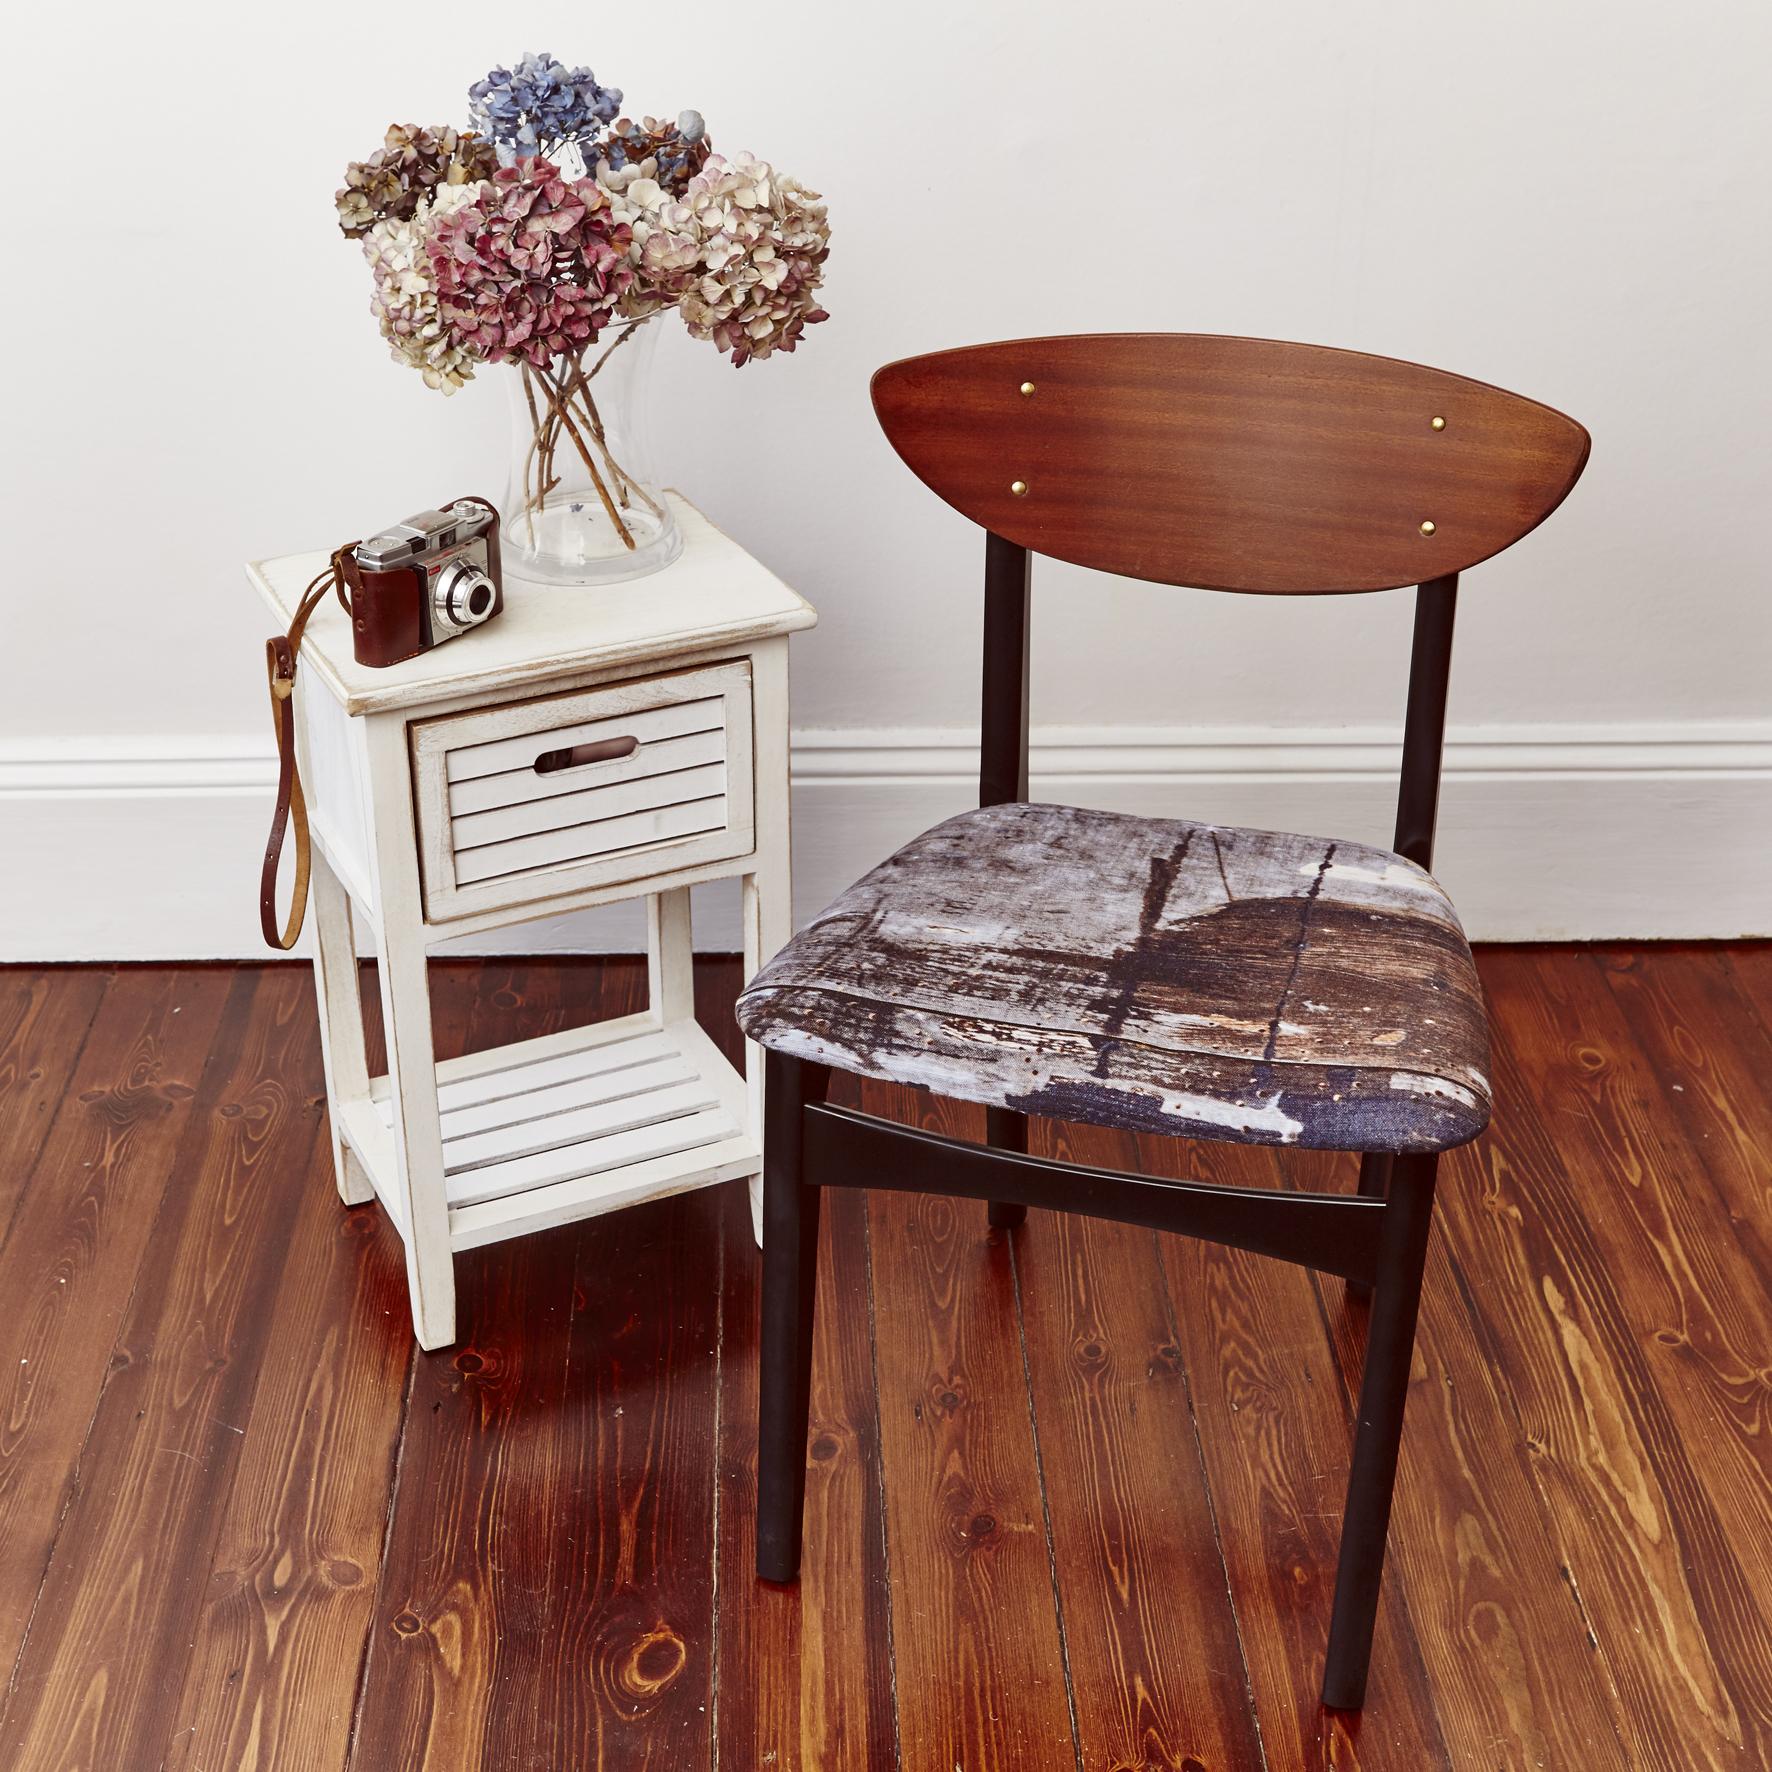 Set of 4 Danish Design Teak & Beech Chairs